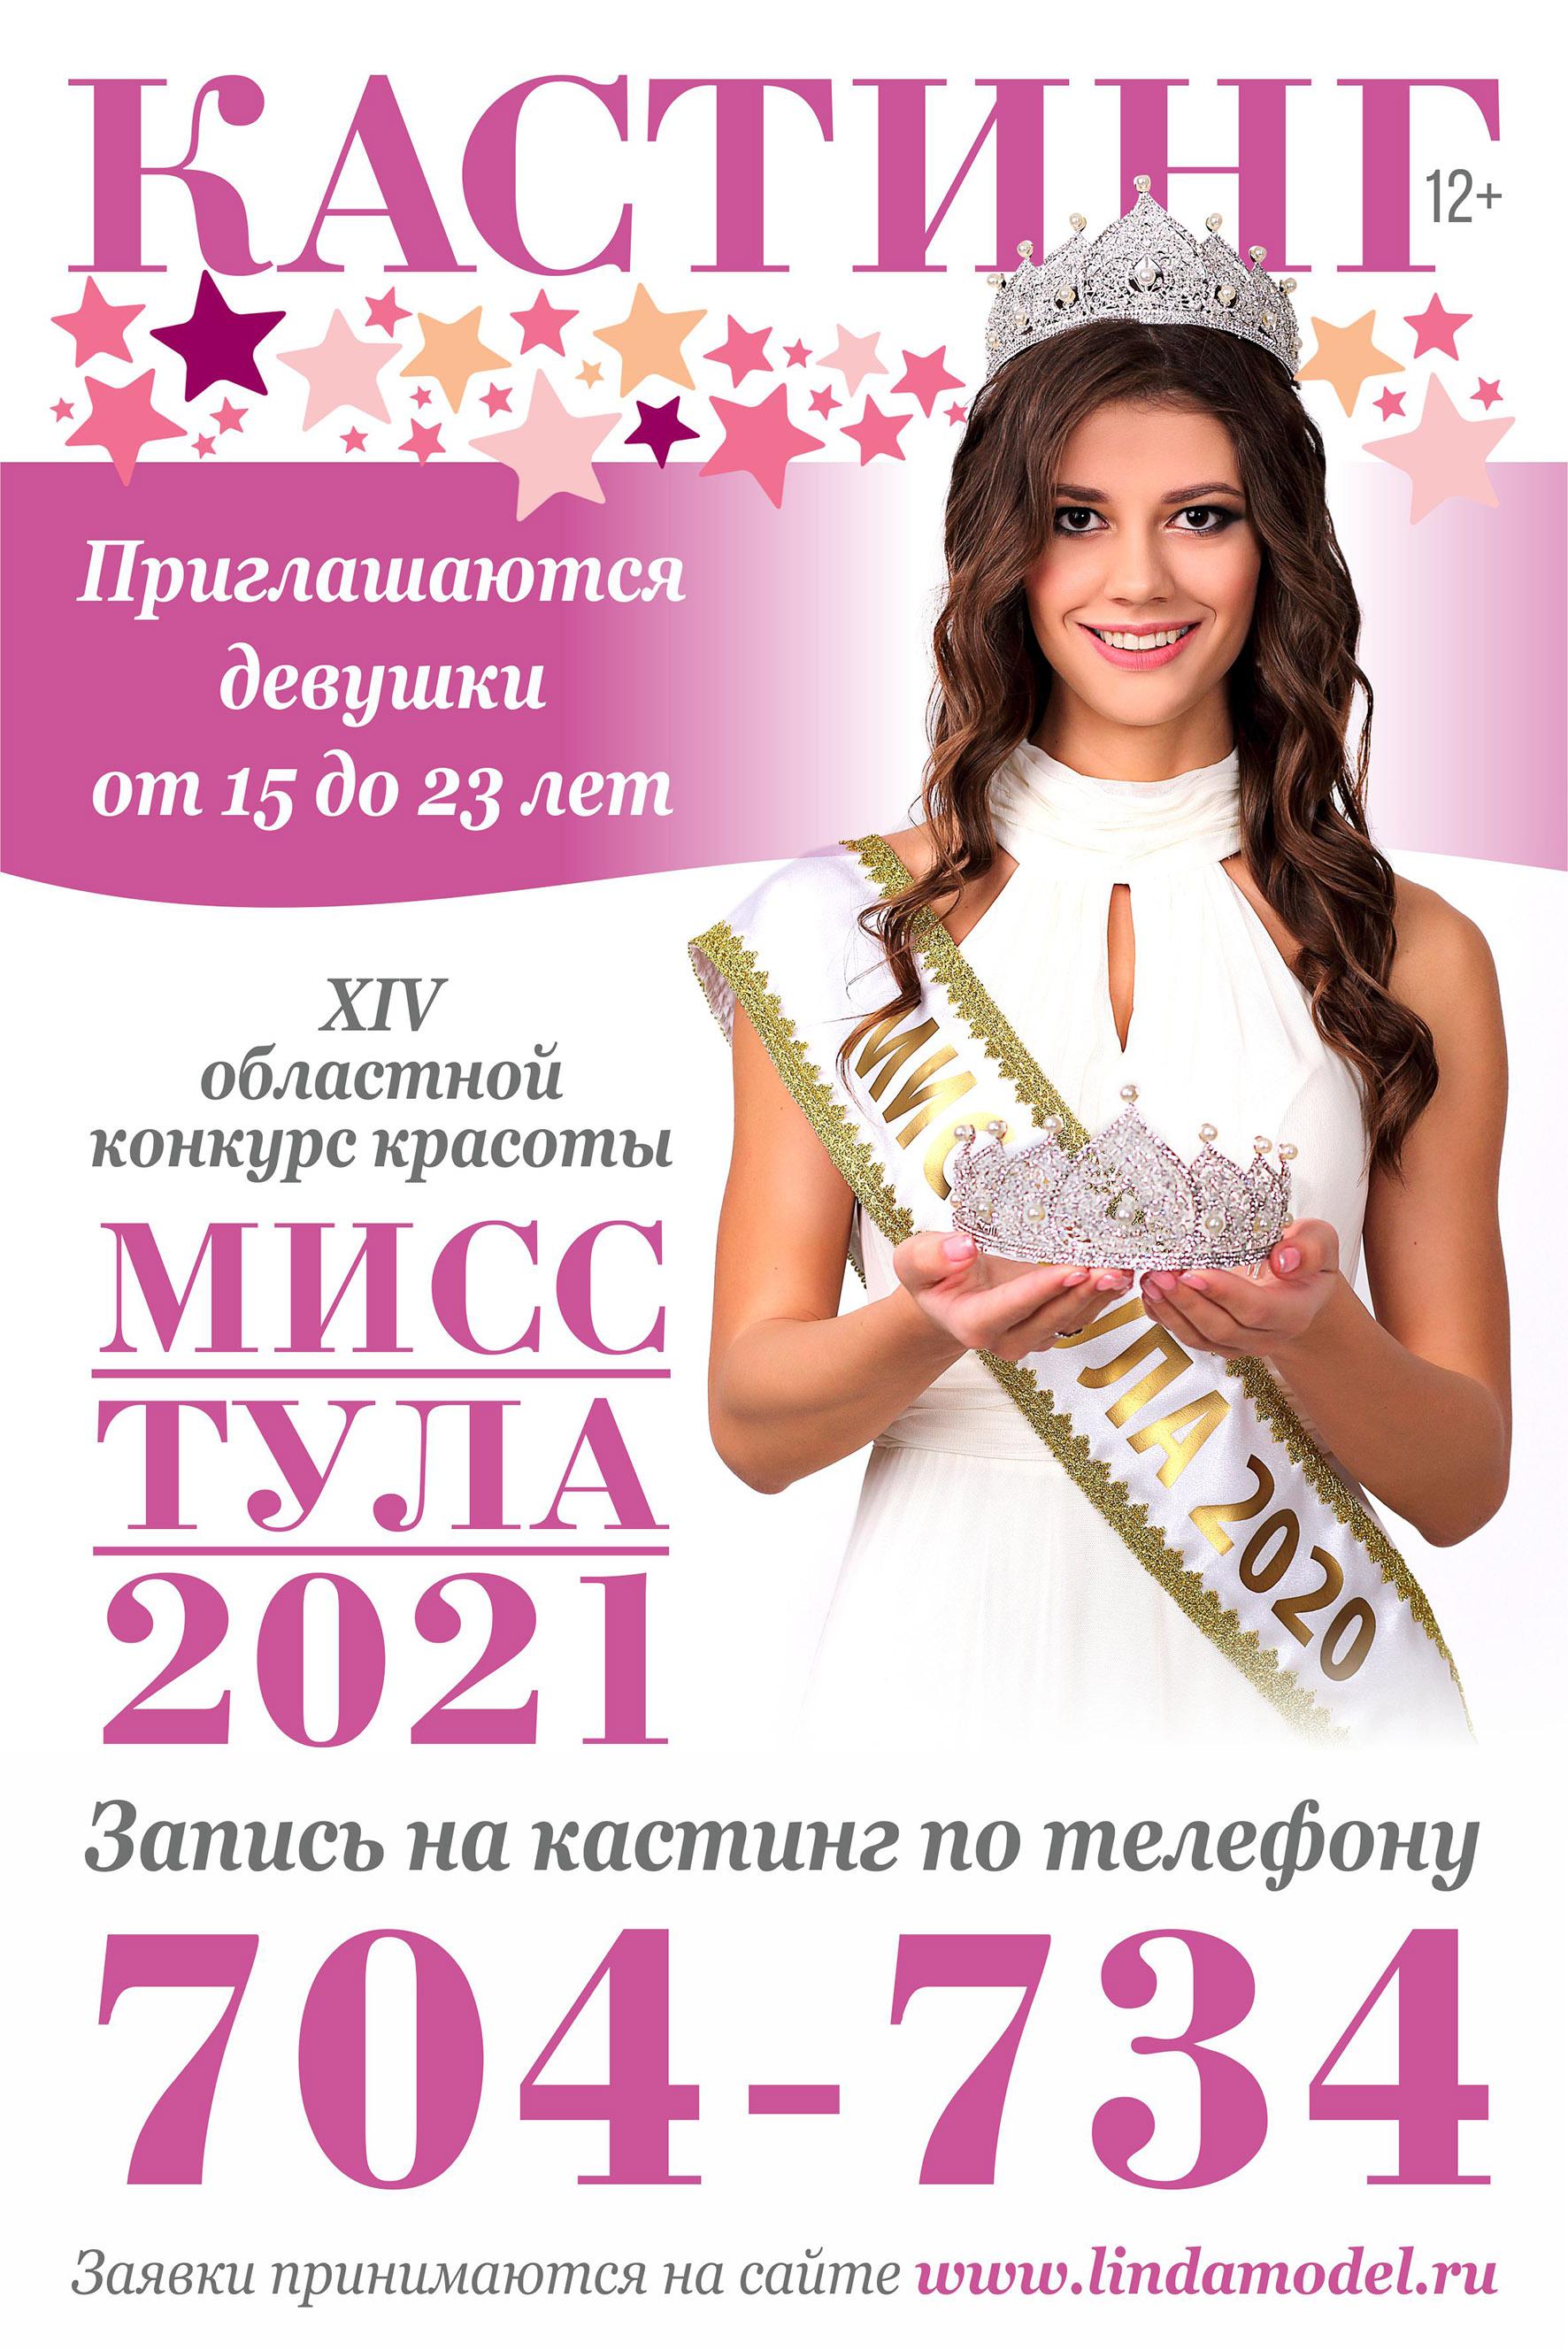 кастинг Мисс Тула 2020_1000х667